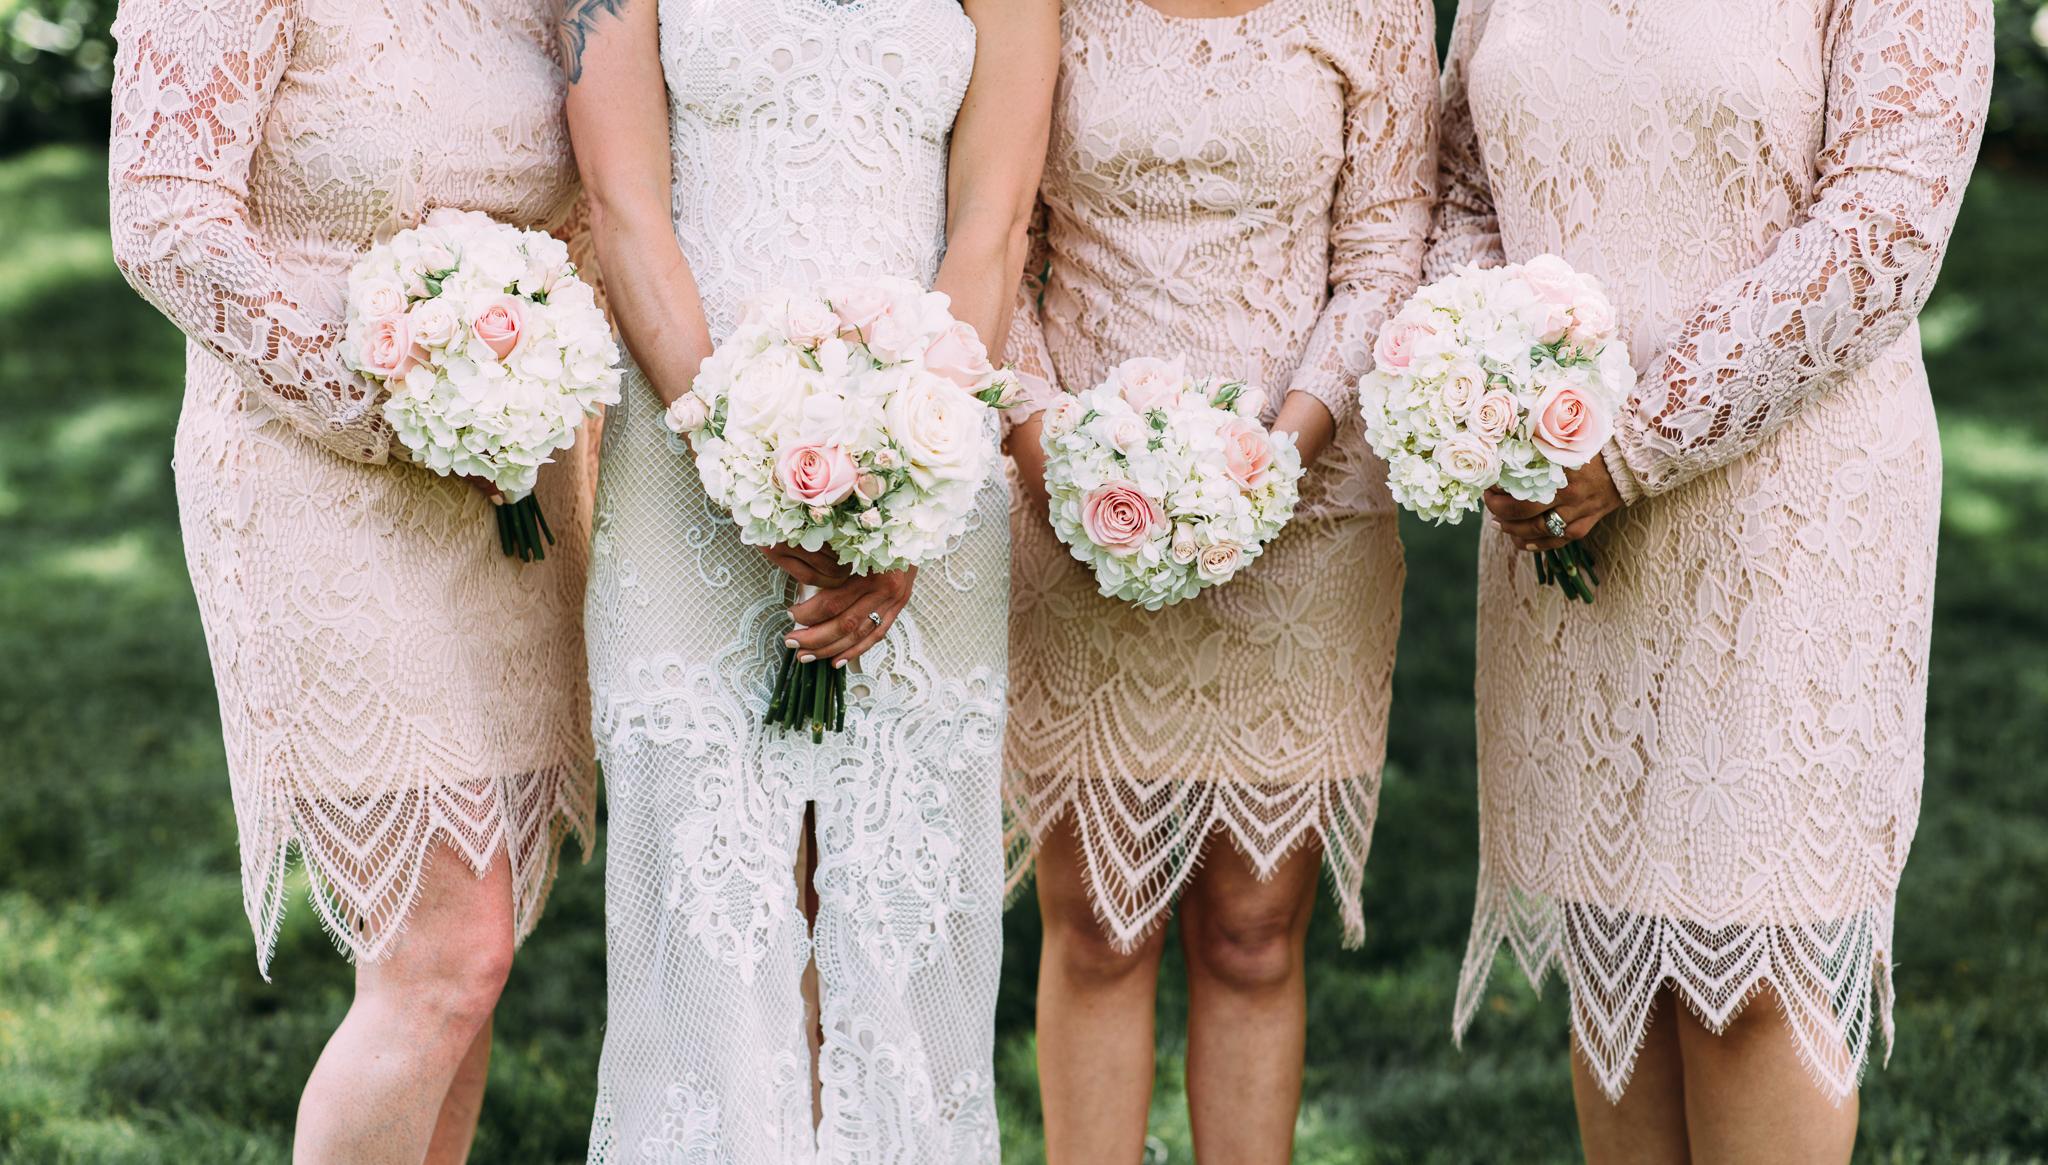 maine-wedding-details-flowers-floral-portraits.jpg